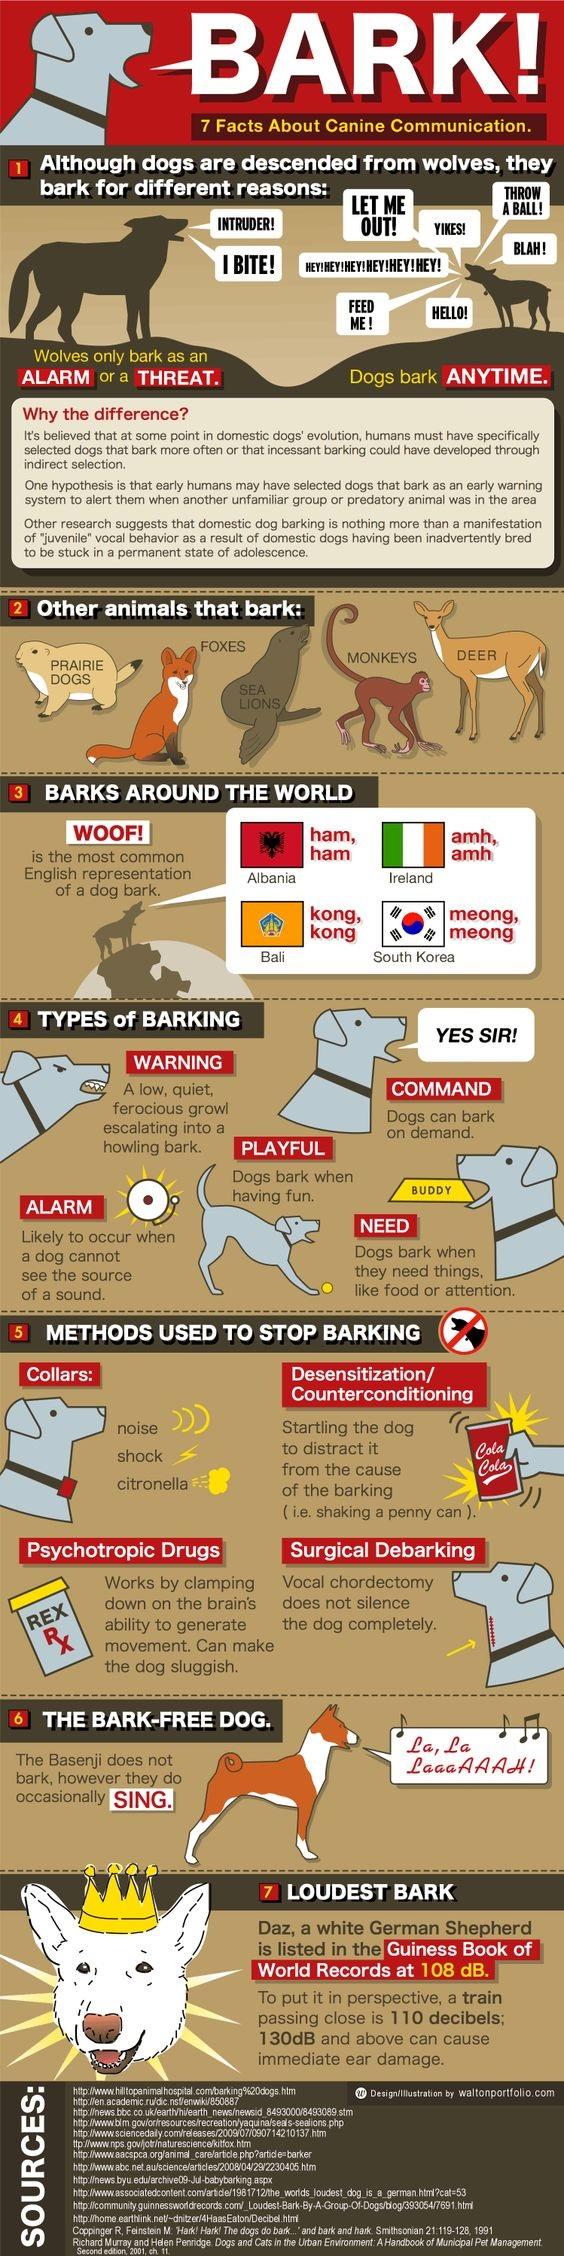 Bark Infographic